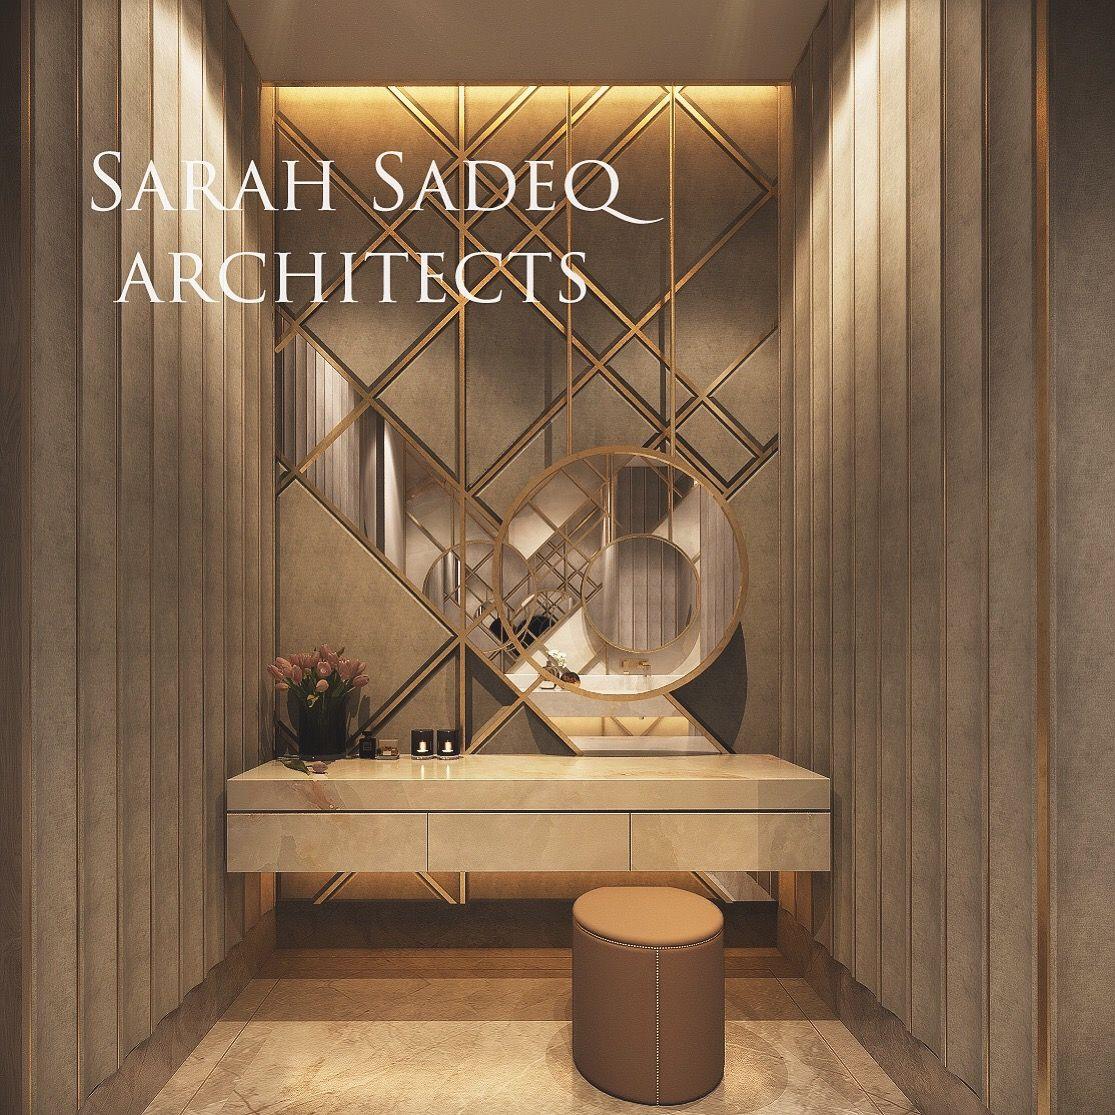 also sarah sadeq architects interior design in living room rh pinterest